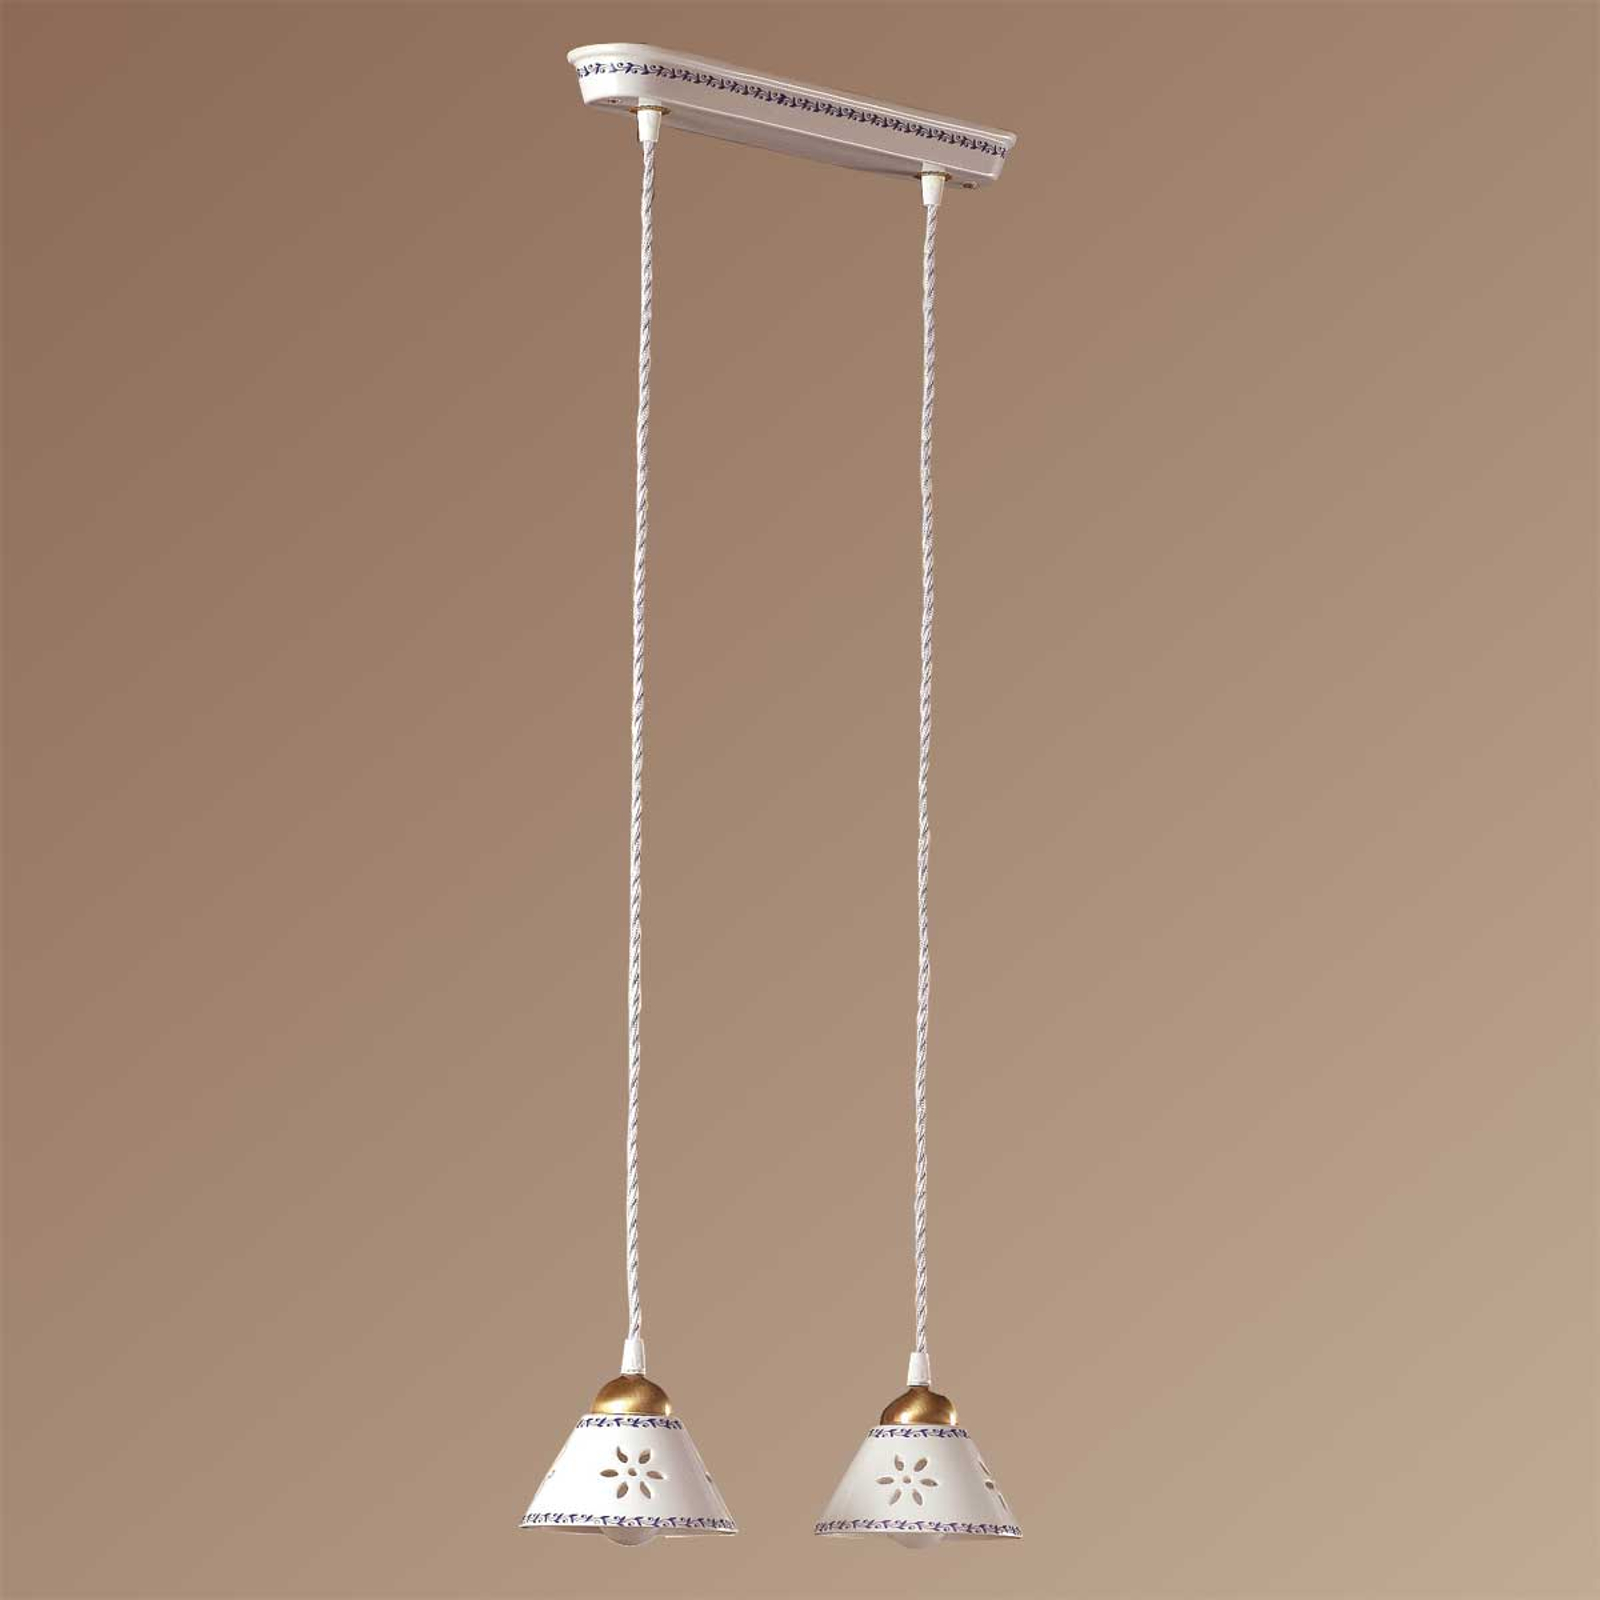 2-bulb NONNA hanging light, made of white ceramic_2013027_1